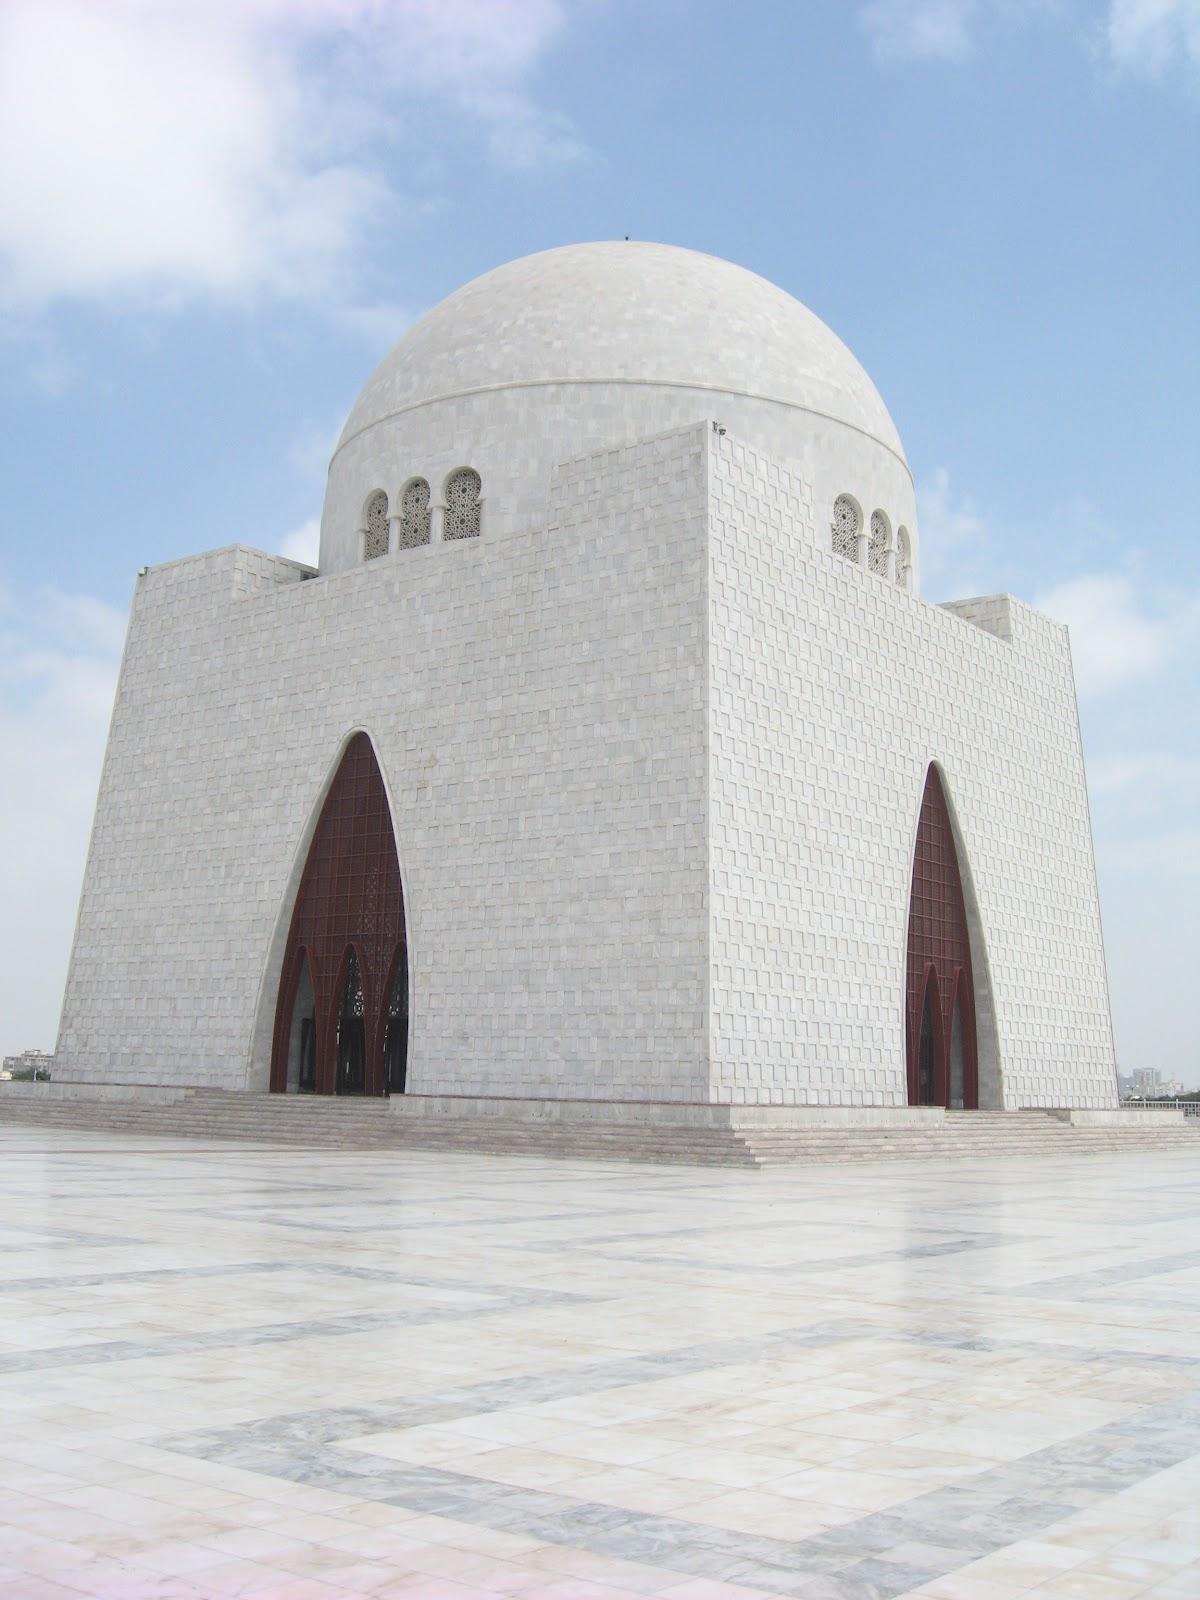 quaid azam mazar dating Mazar-e-quaid: mazar-equaid - see 170 traveller reviews, 89 candid photos, and great deals for karachi, pakistan, at tripadvisor.